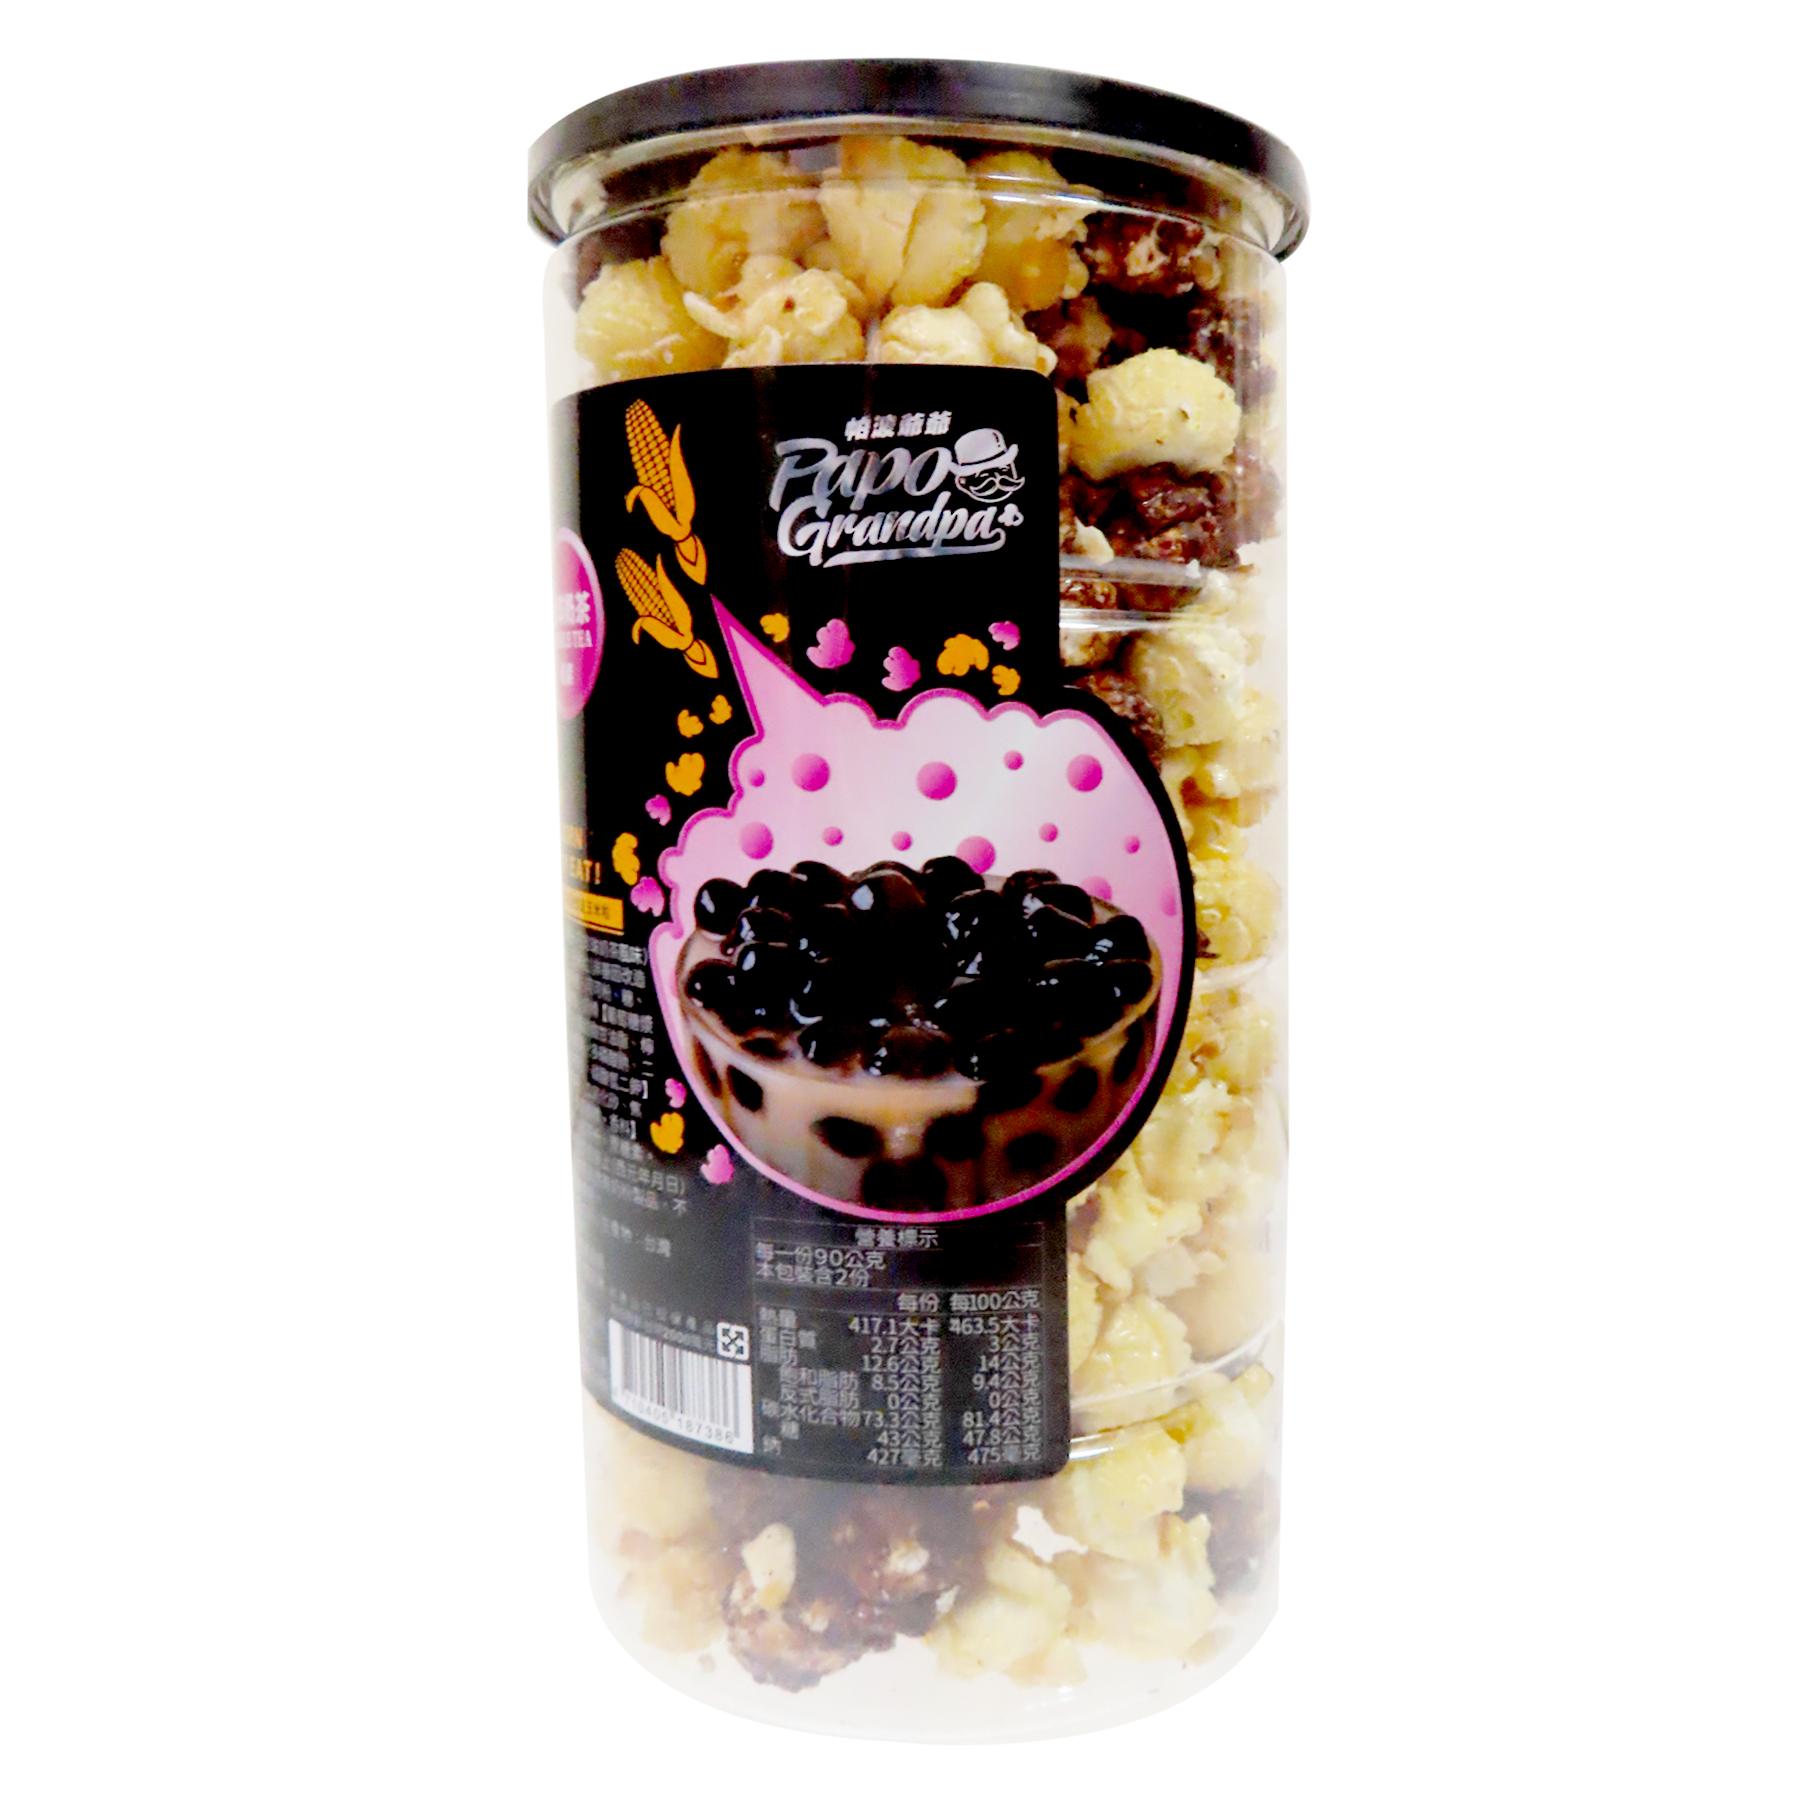 Image Papo Popcorn Bubble Tea 金砚-珍珠奶茶爆米花 180grams